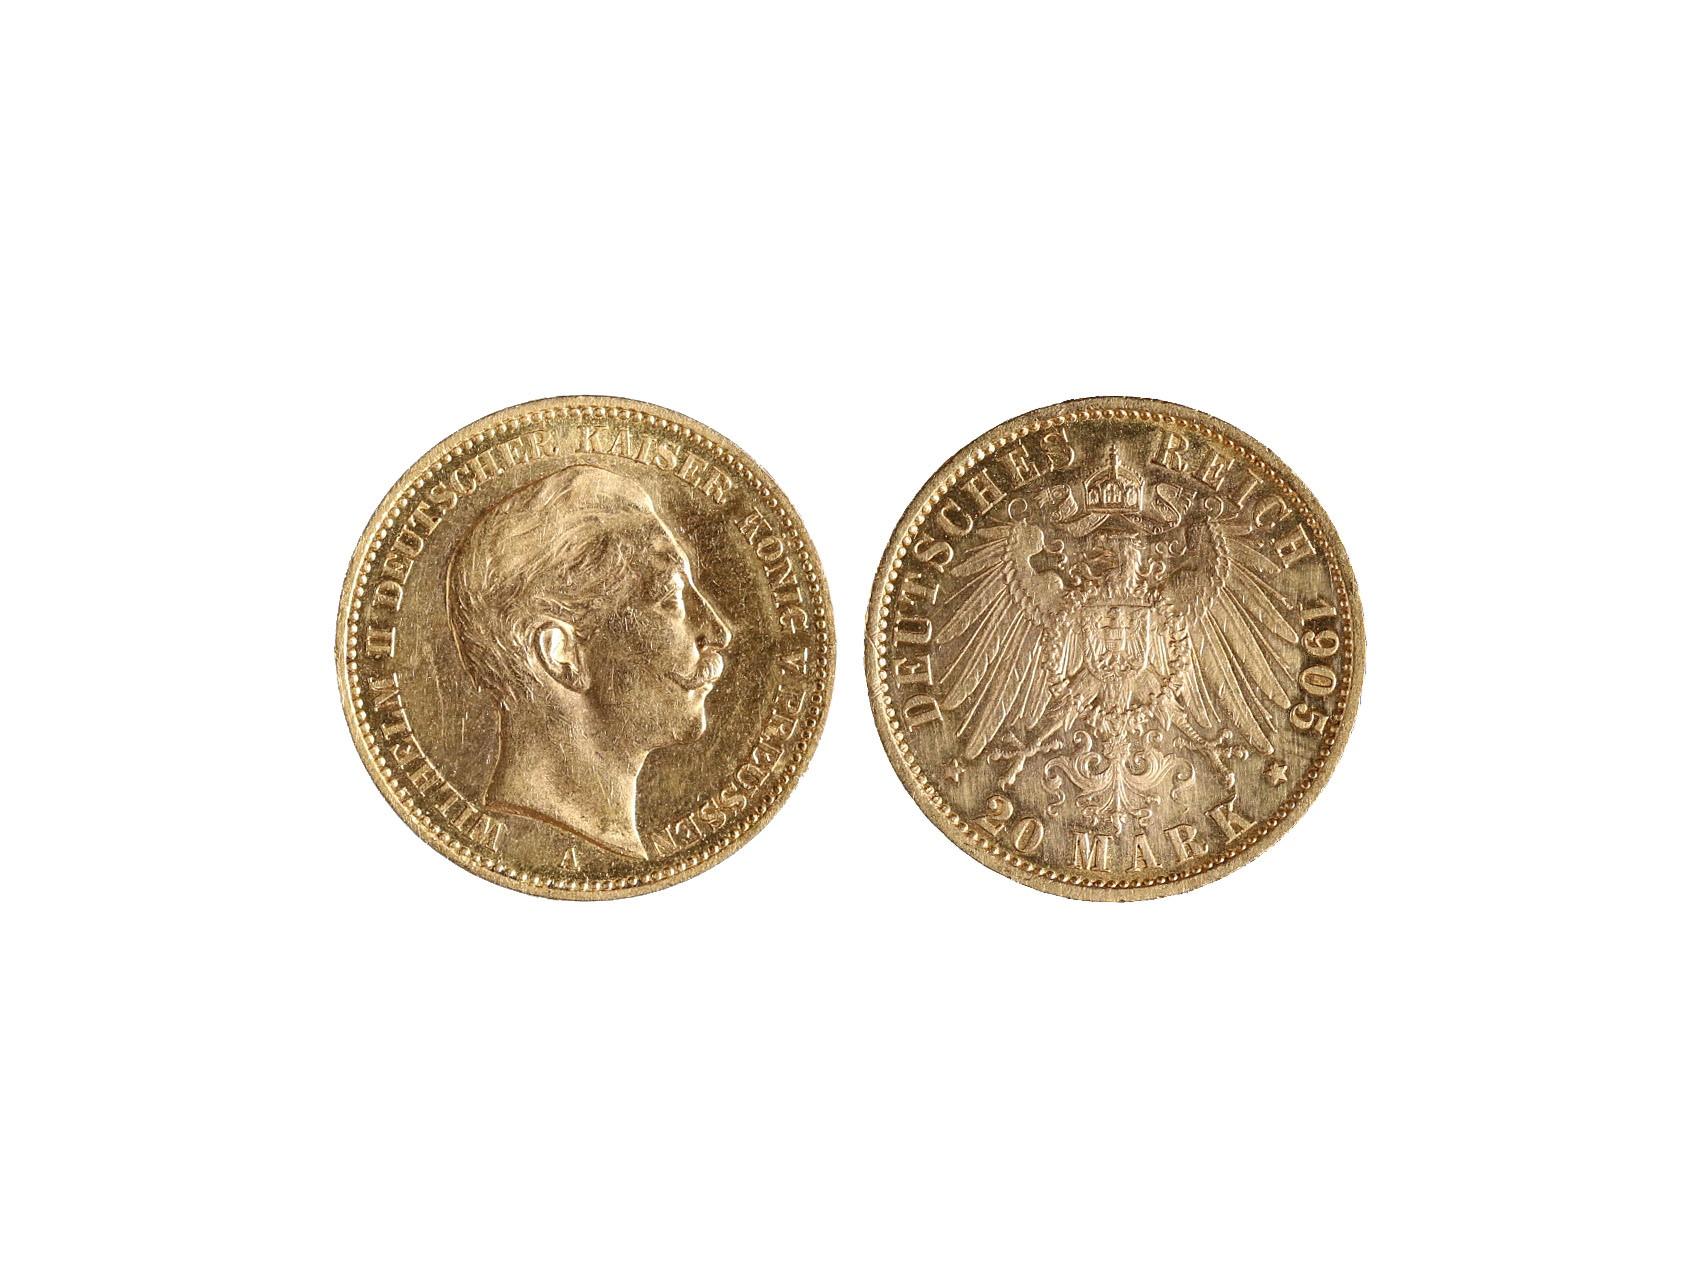 Německo-Prusko, Wilhelm II. 1888-1918 - 20 Marka 1905 A, KM.537